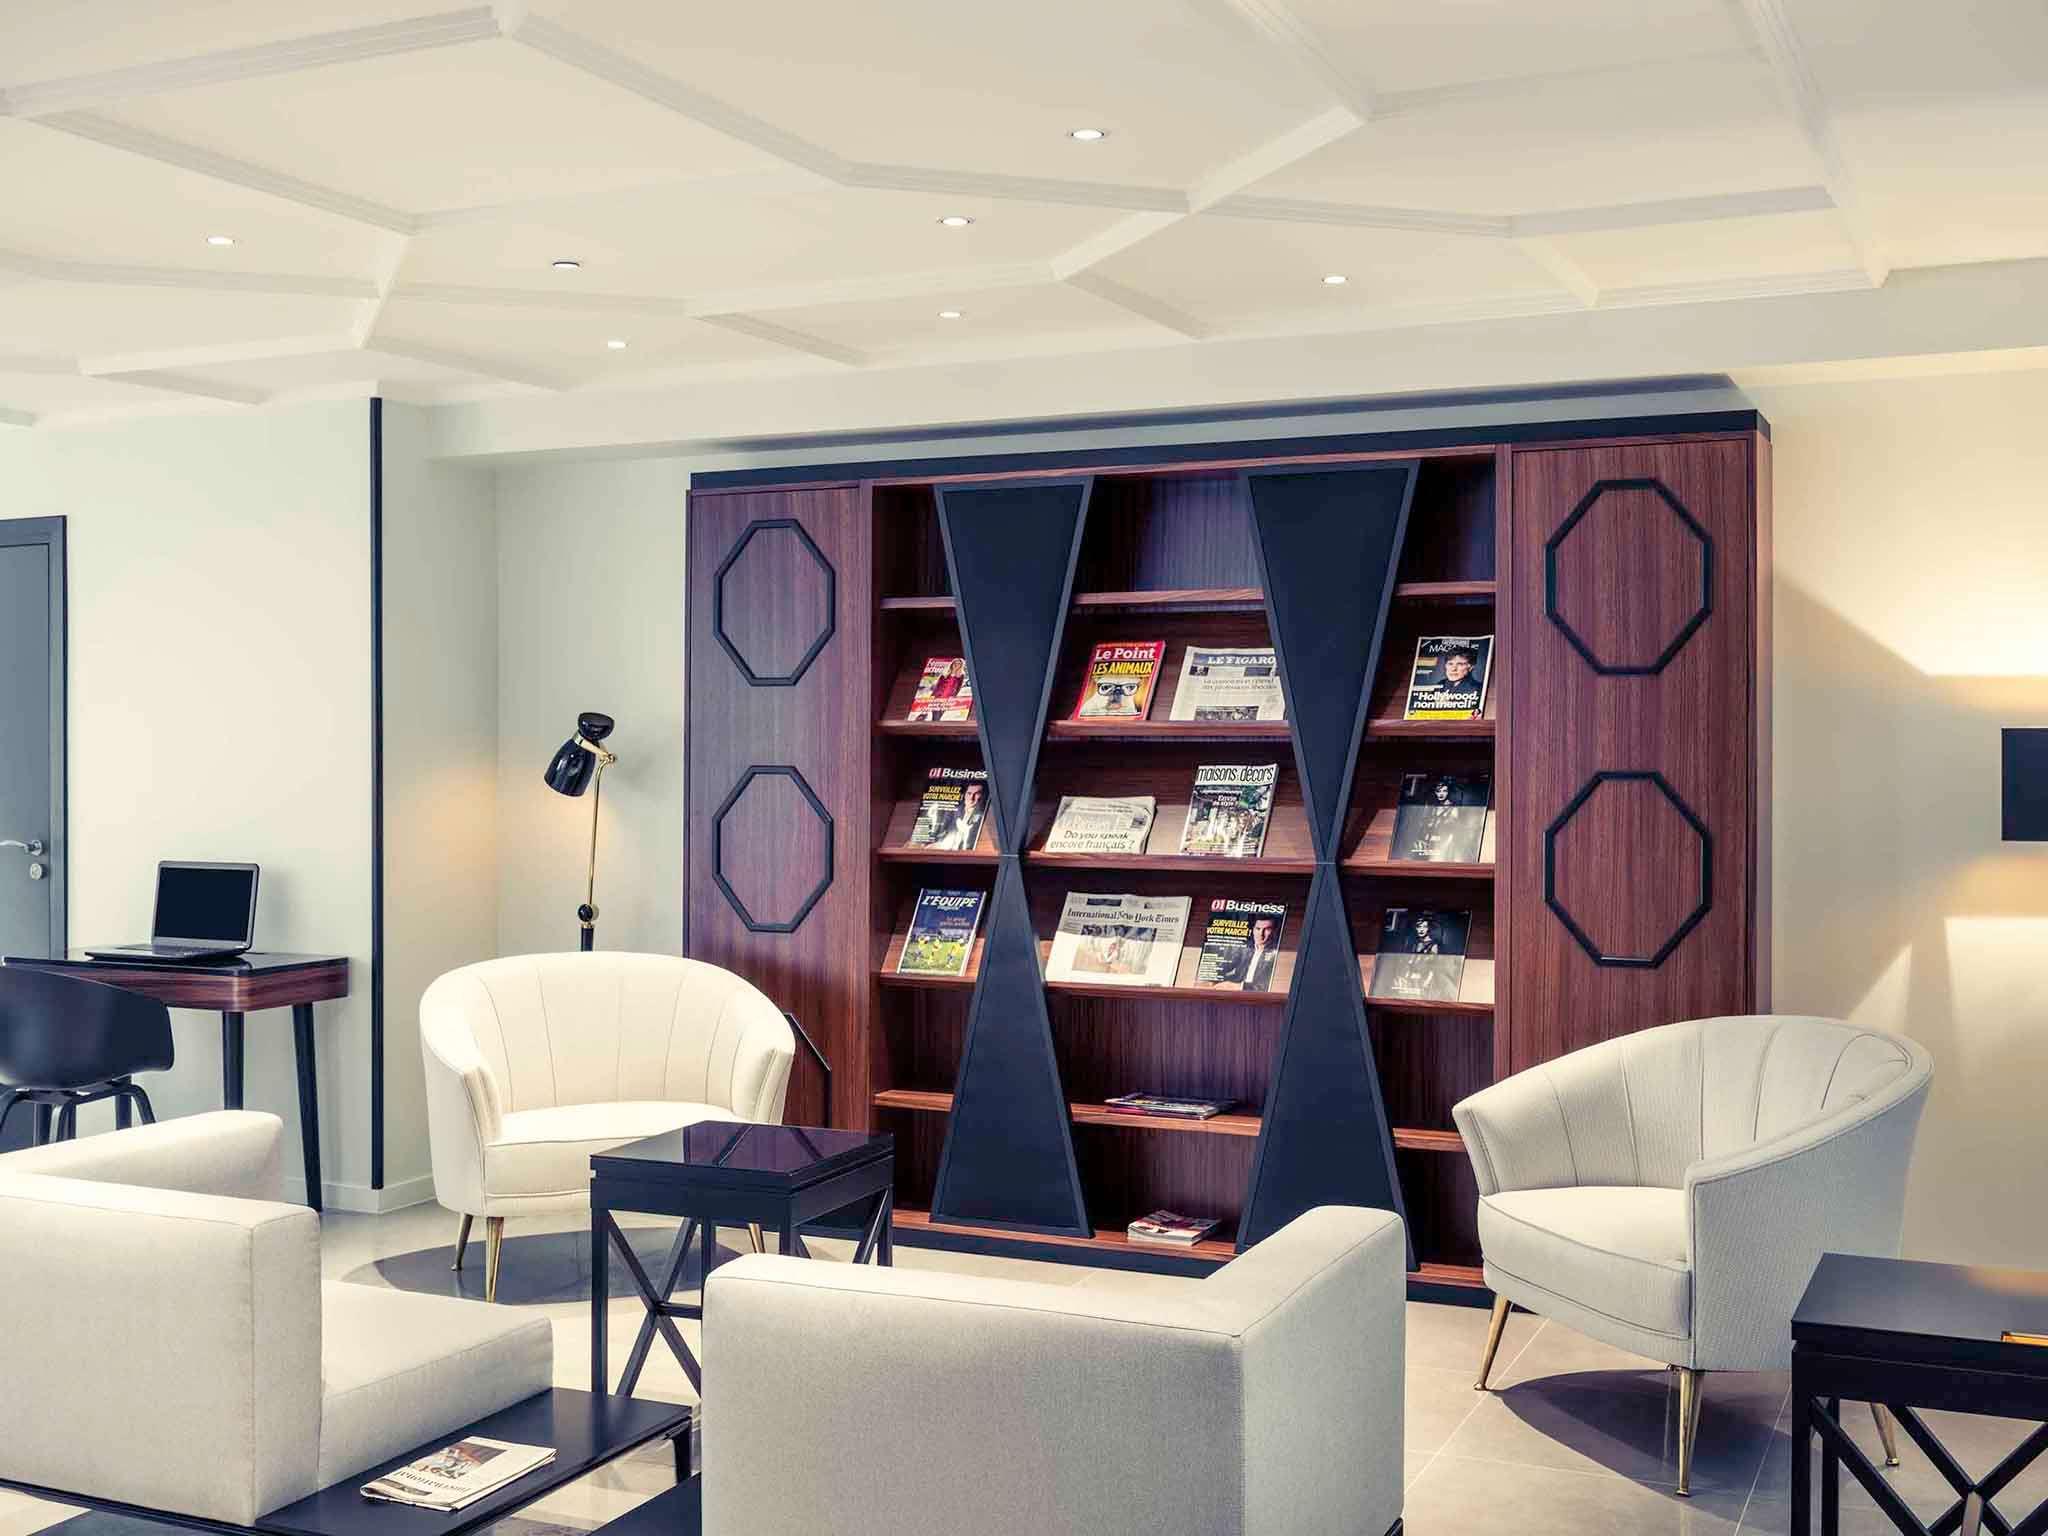 Hotel – Hotel Mercure Paris Arco do Triunfo Wagram